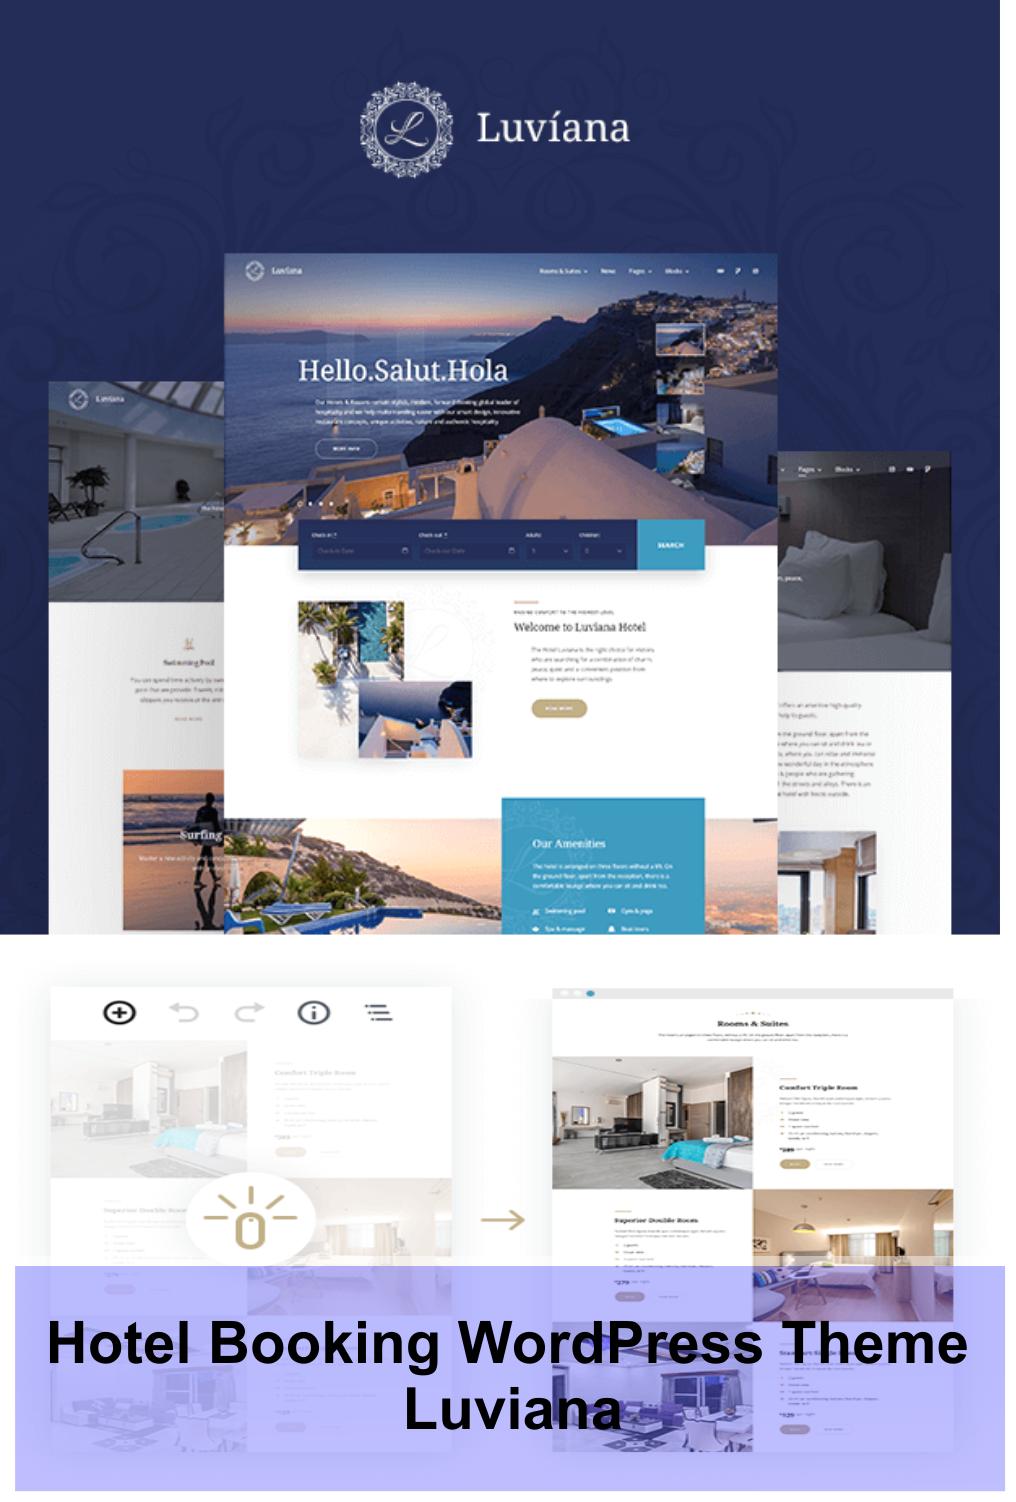 Hotel Booking Wordpress Theme Luviana Wordpress Theme Website Design Wordpress Wordpress Theme Design